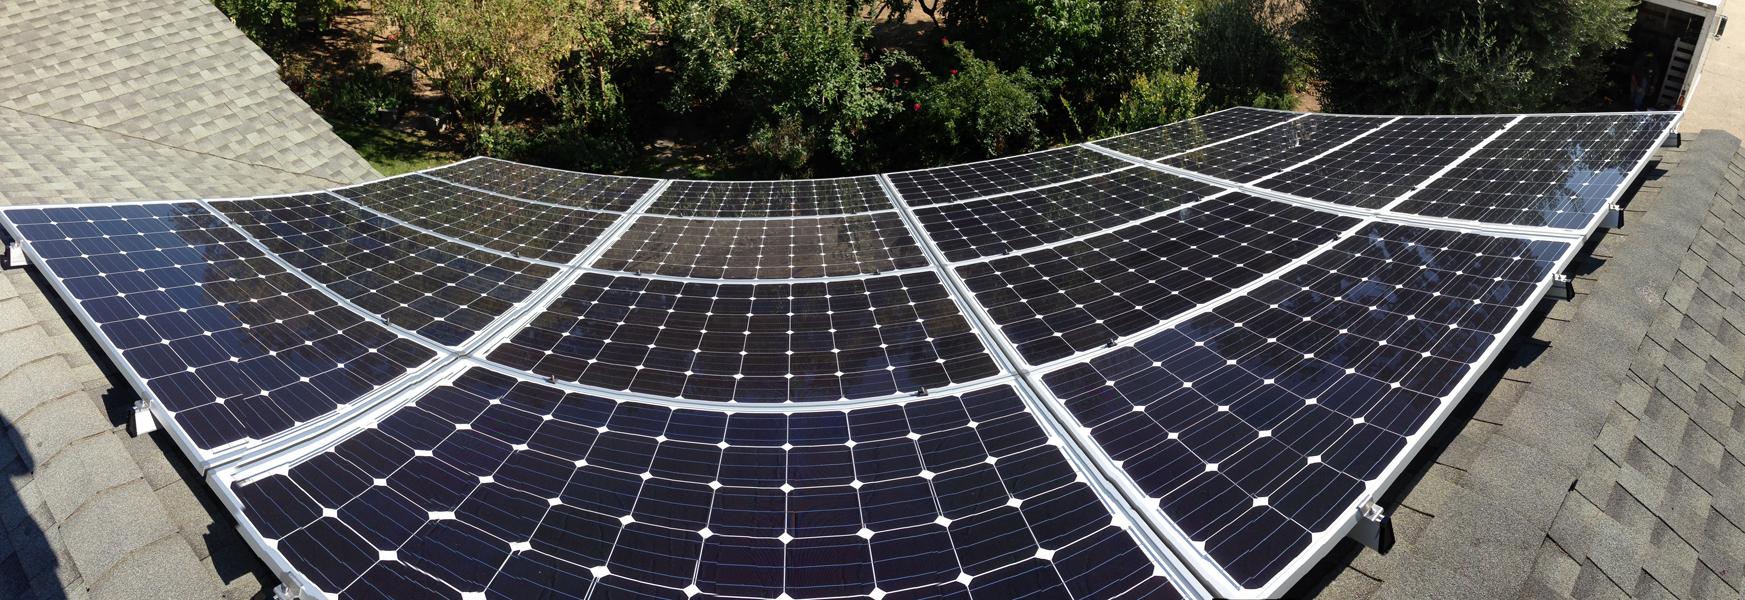 Solar panel fisheye